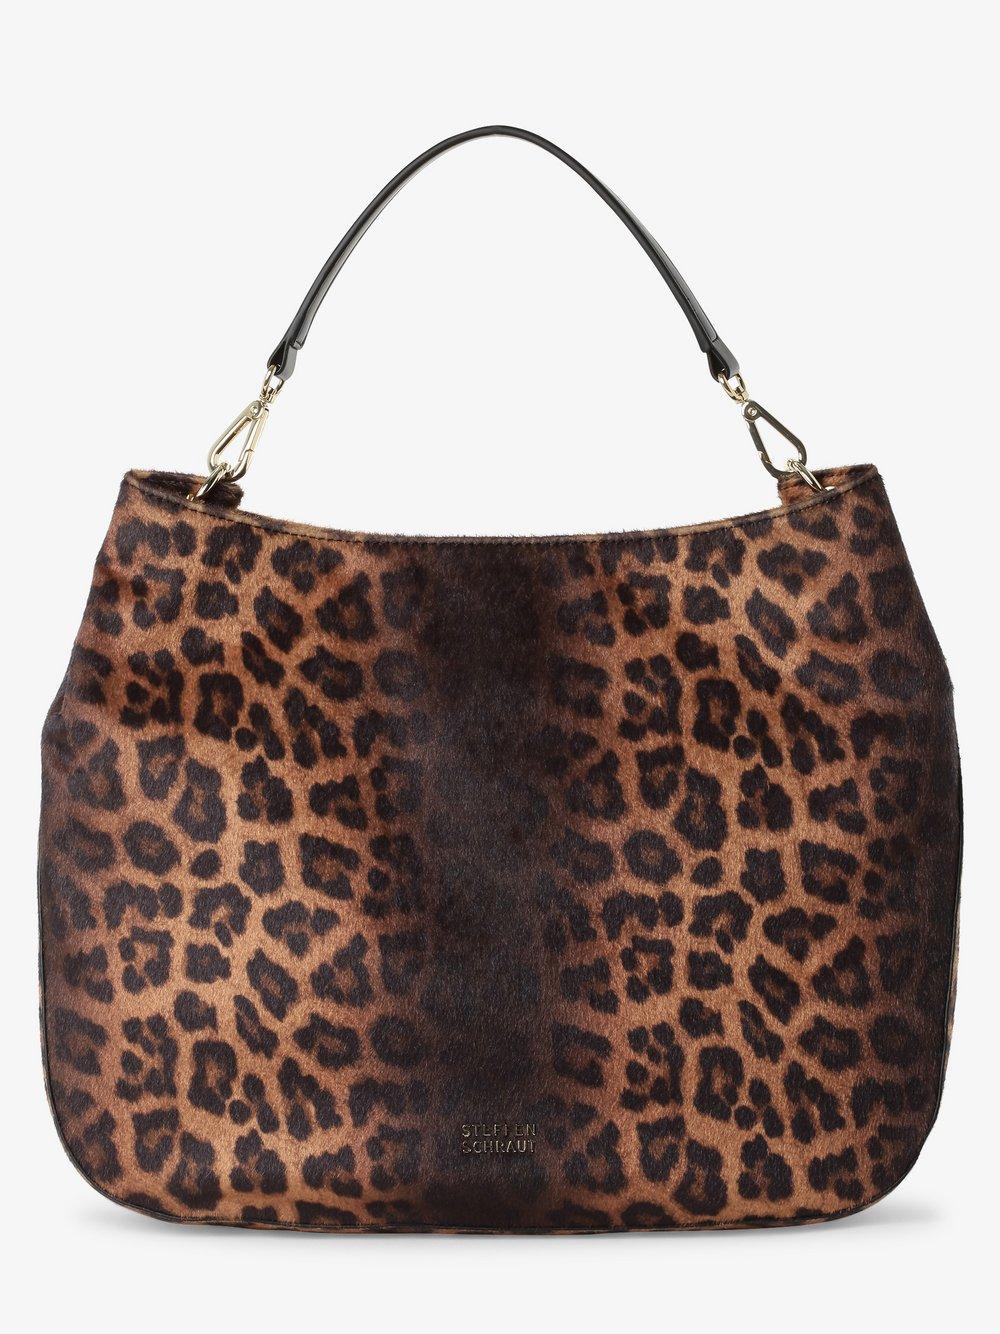 STEFFEN SCHRAUT – Damska torba shopper, czarny Van Graaf 483009-0001-00000